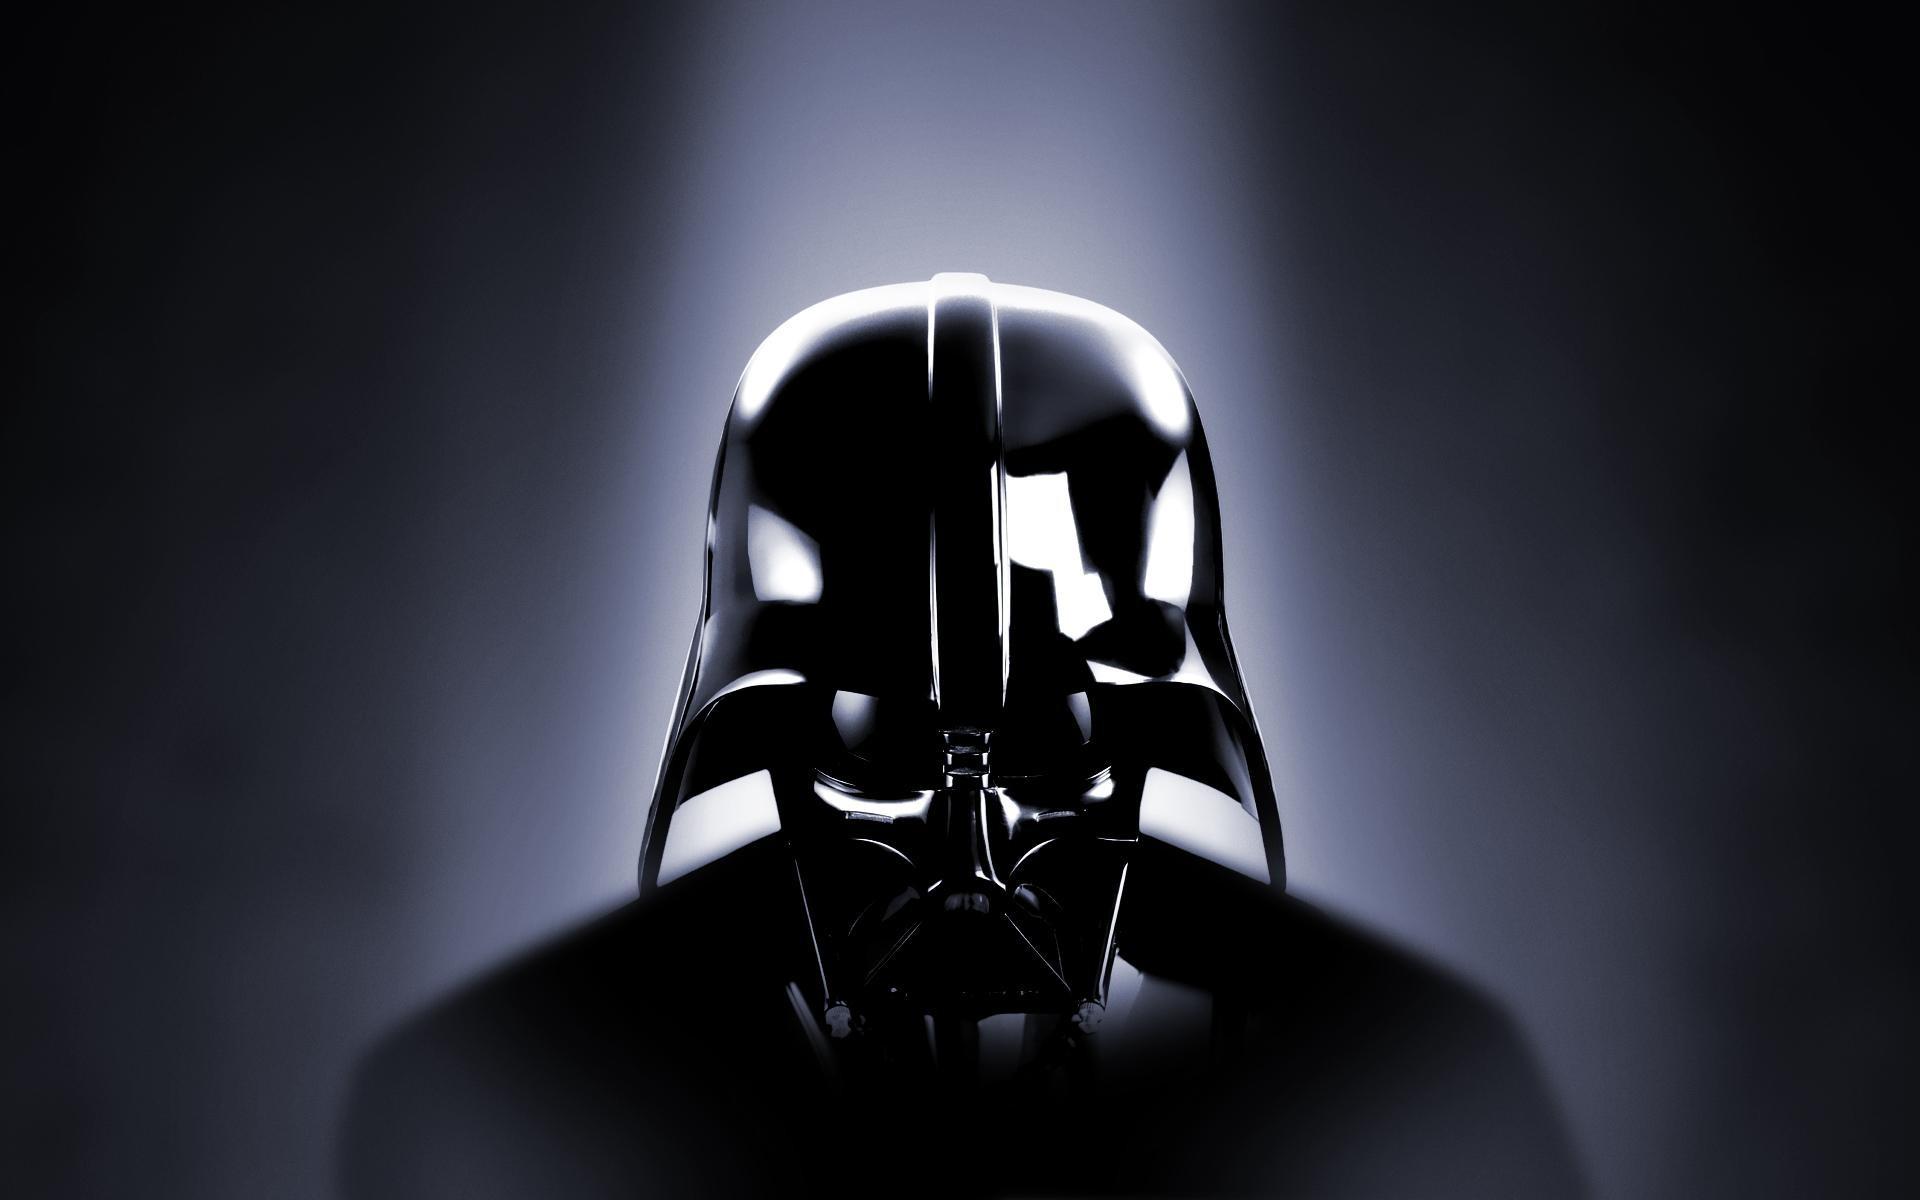 Disney Star Wars Desktop Wallpaper, Fantastic Star Wars Wallpapers